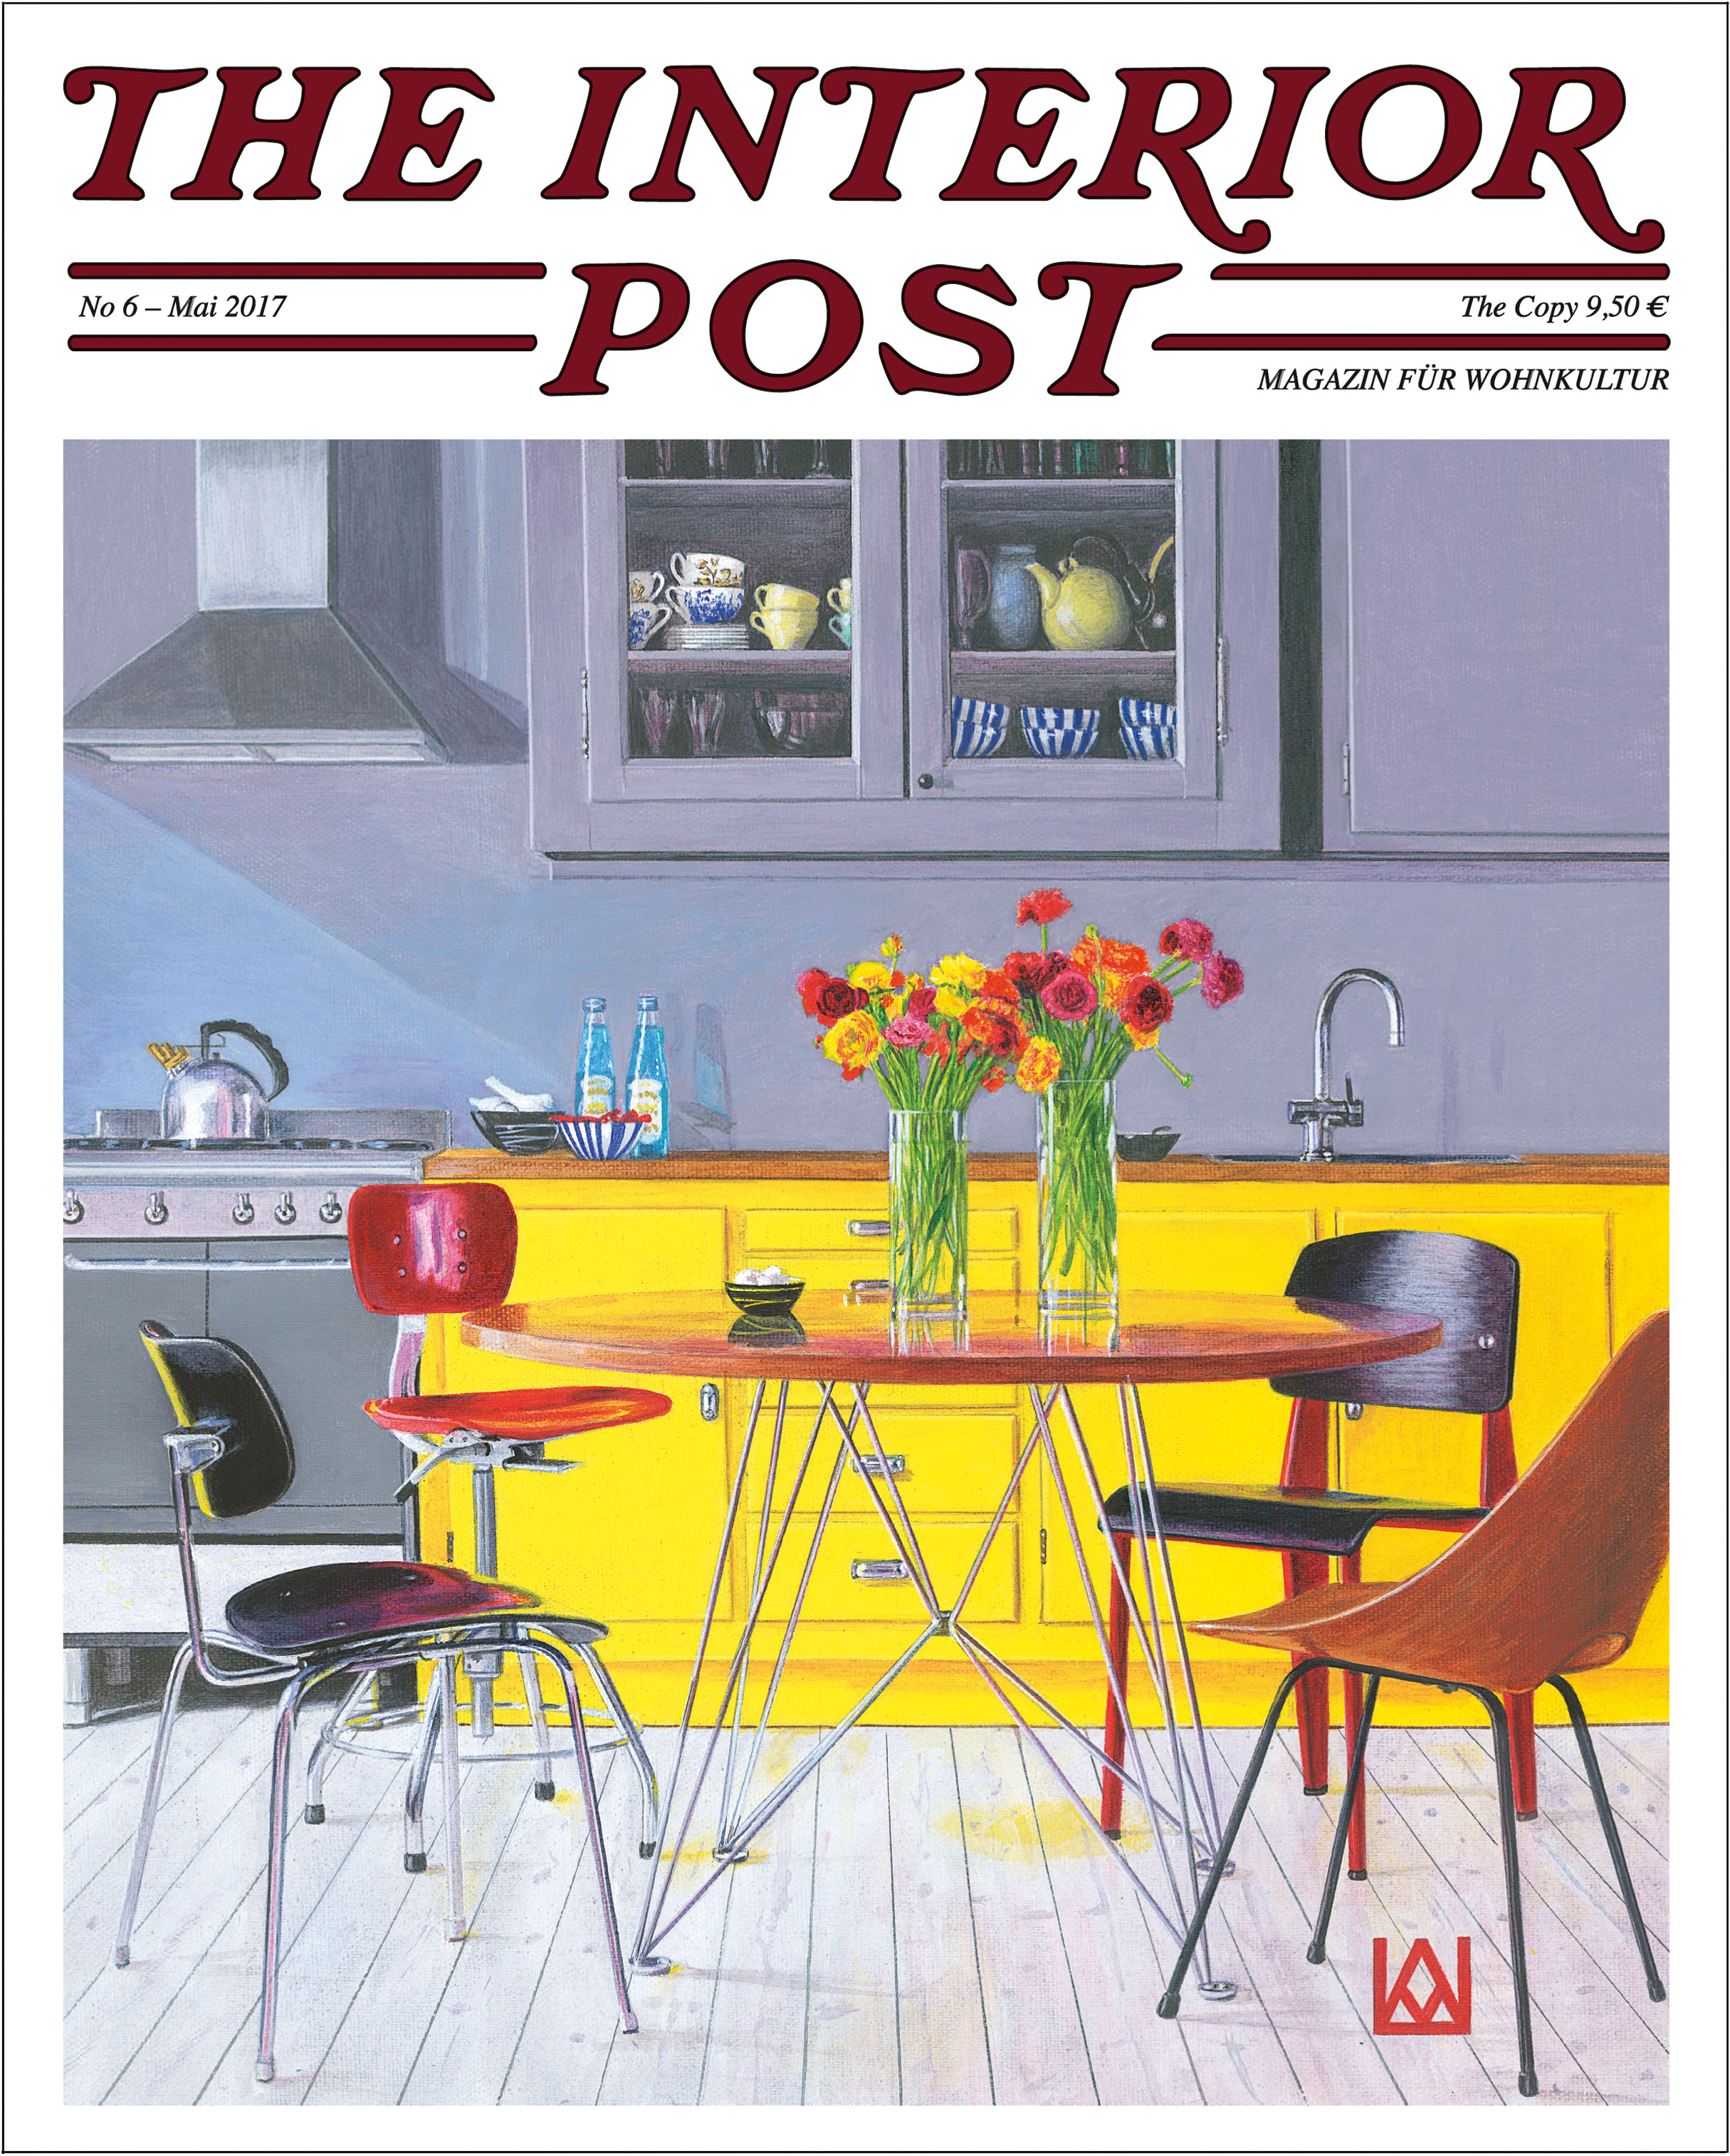 THE INTERIOR POST MAGAZINE, May 2017.